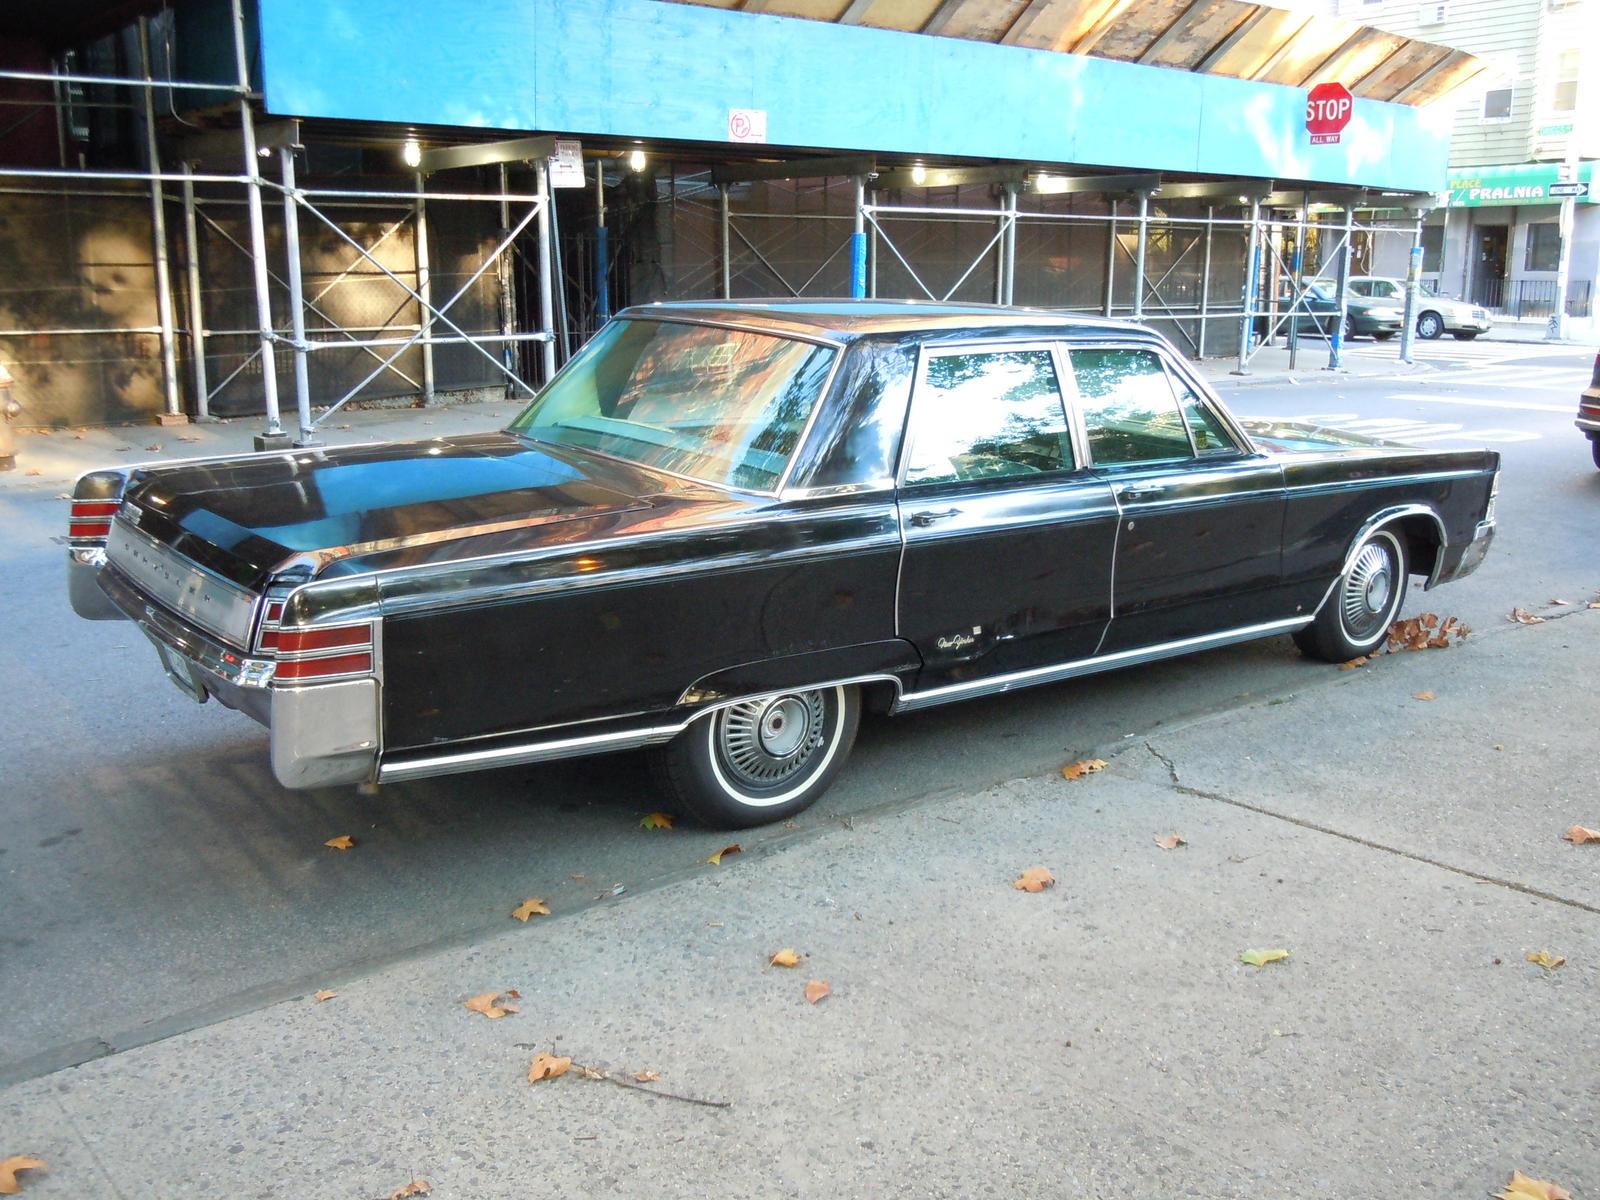 1967 Chrysler New Yorker II by Brooklyn47 on DeviantArt